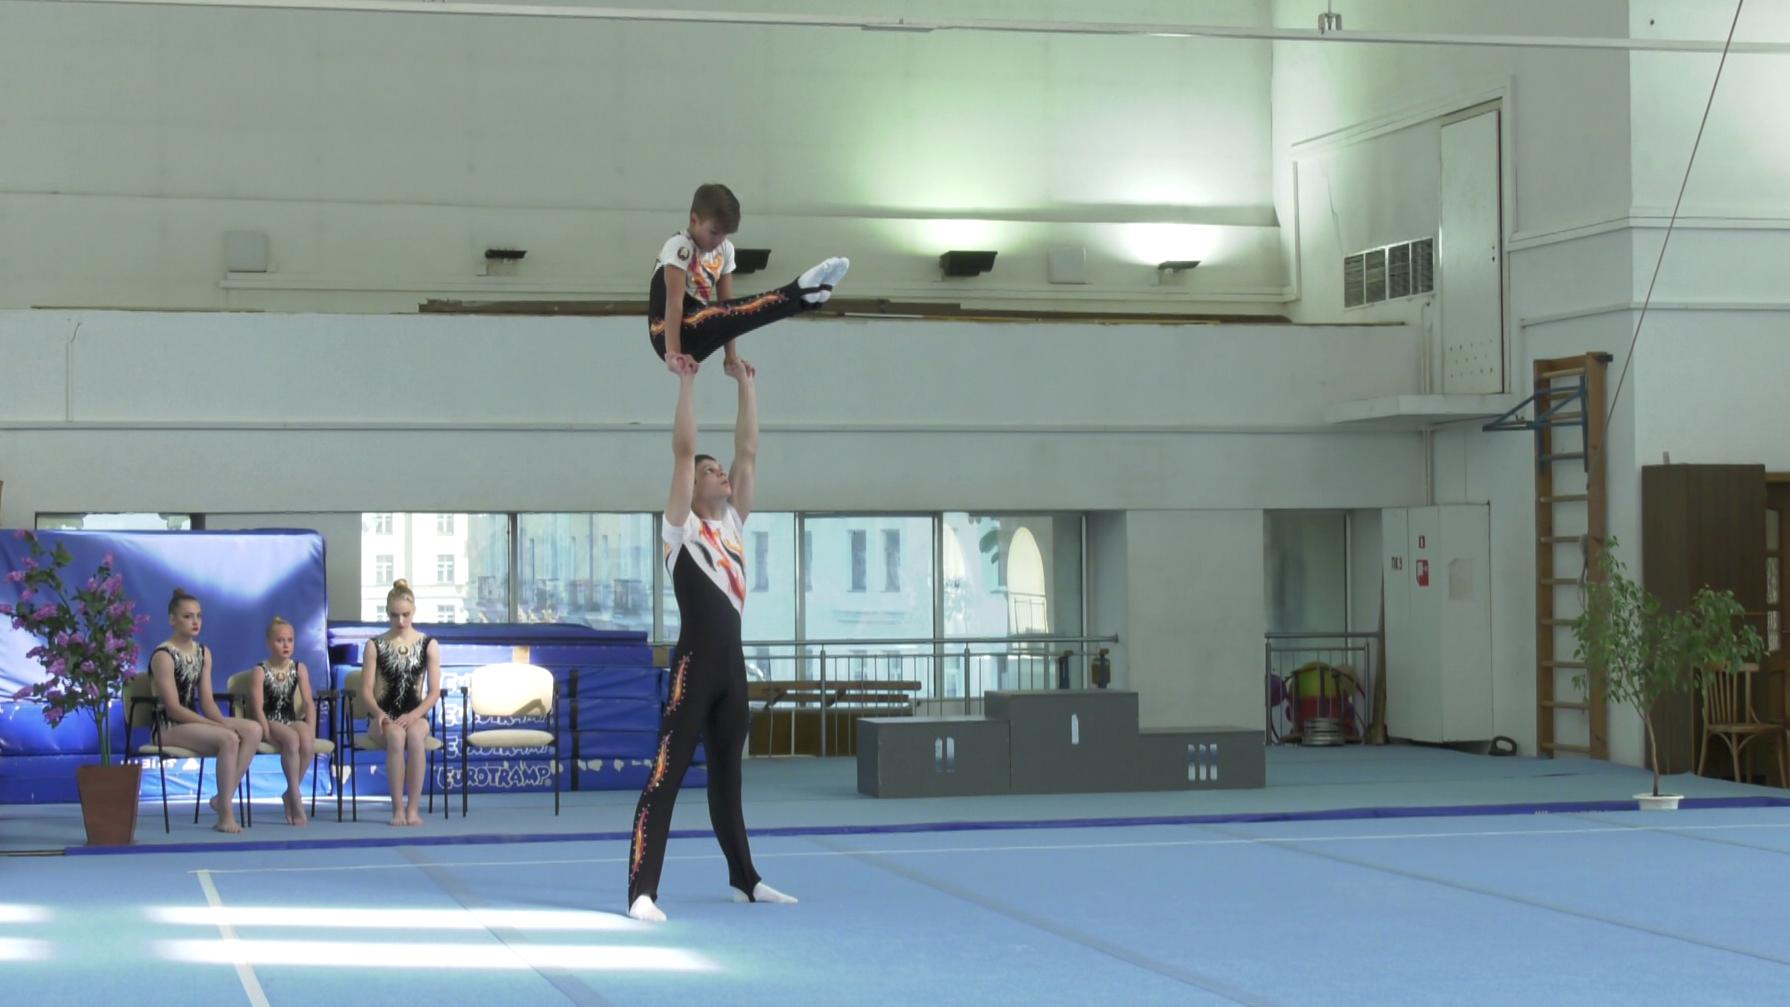 akrobatika - Чемпионат Беларуси по акробатике прошёл в Витебске (видео)